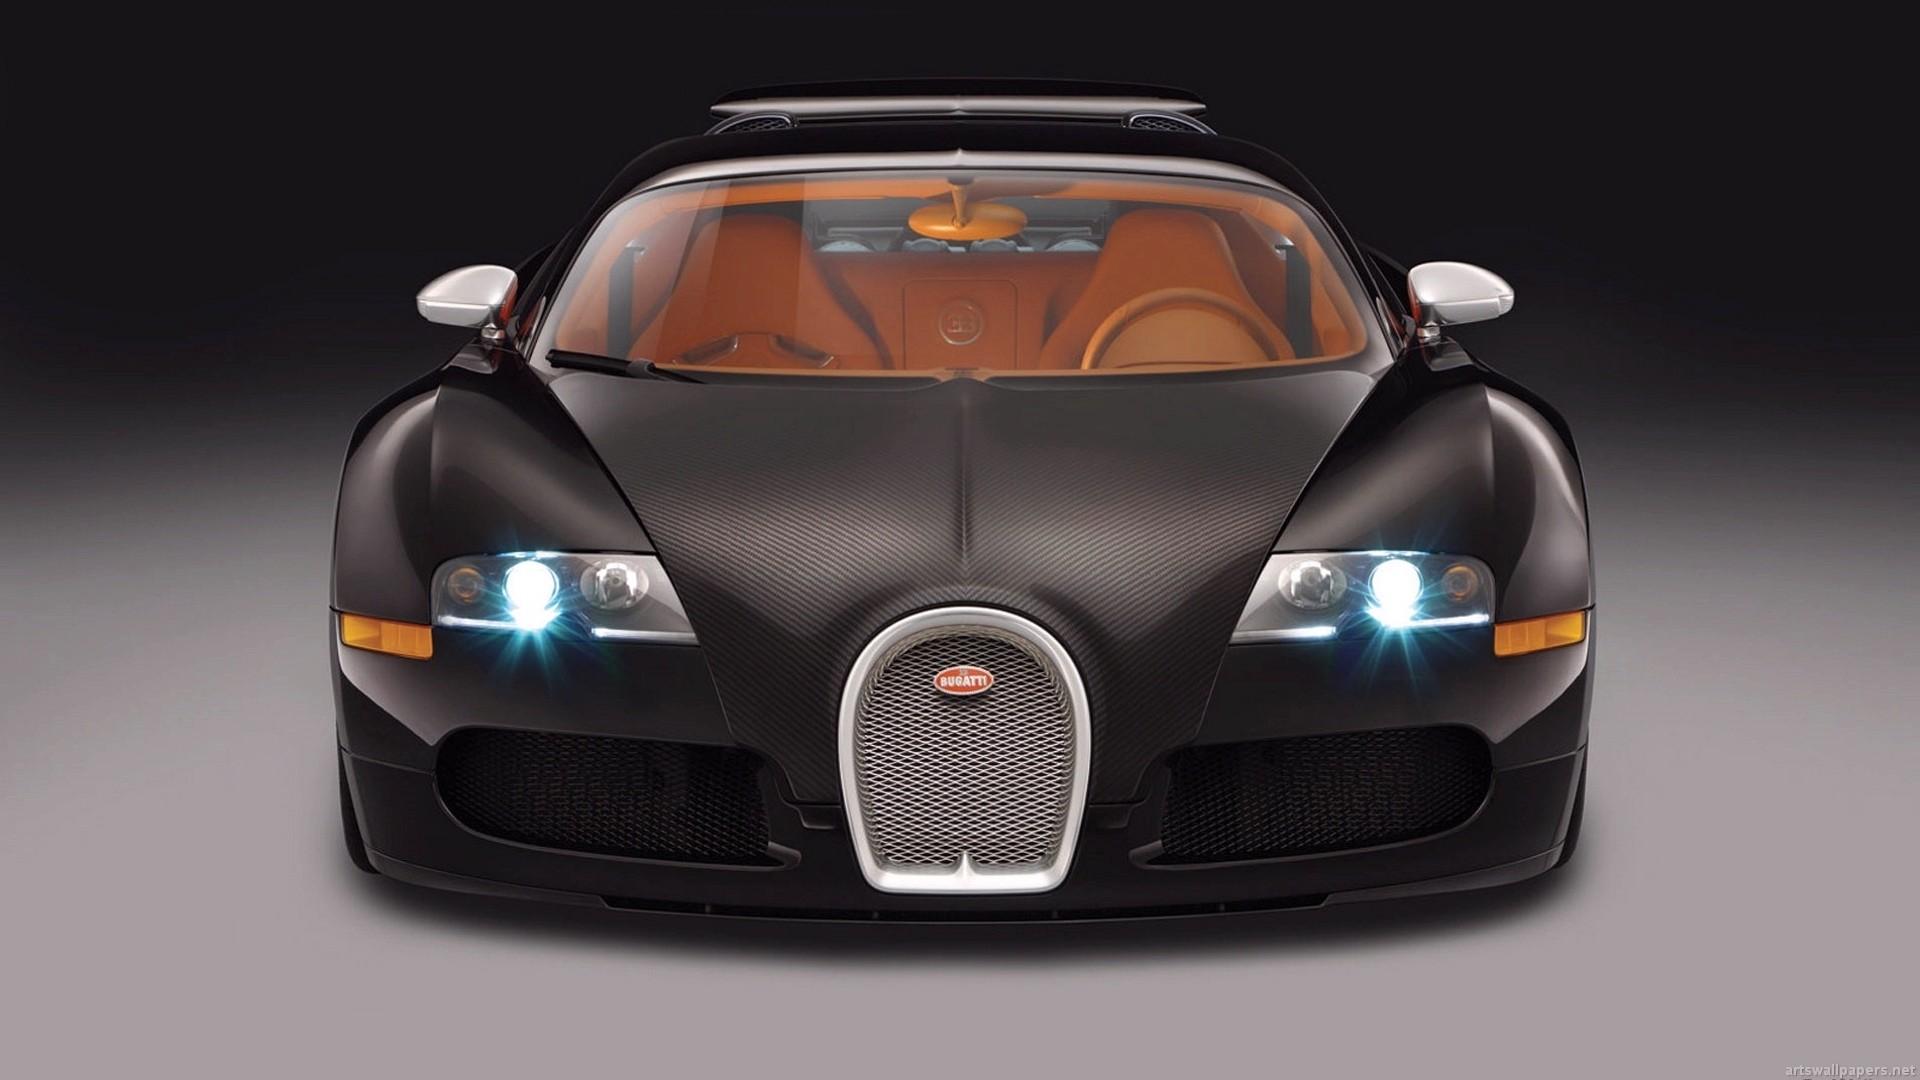 full-hd-widescreen-wallpaper-cars-wallpapers-car-hd-